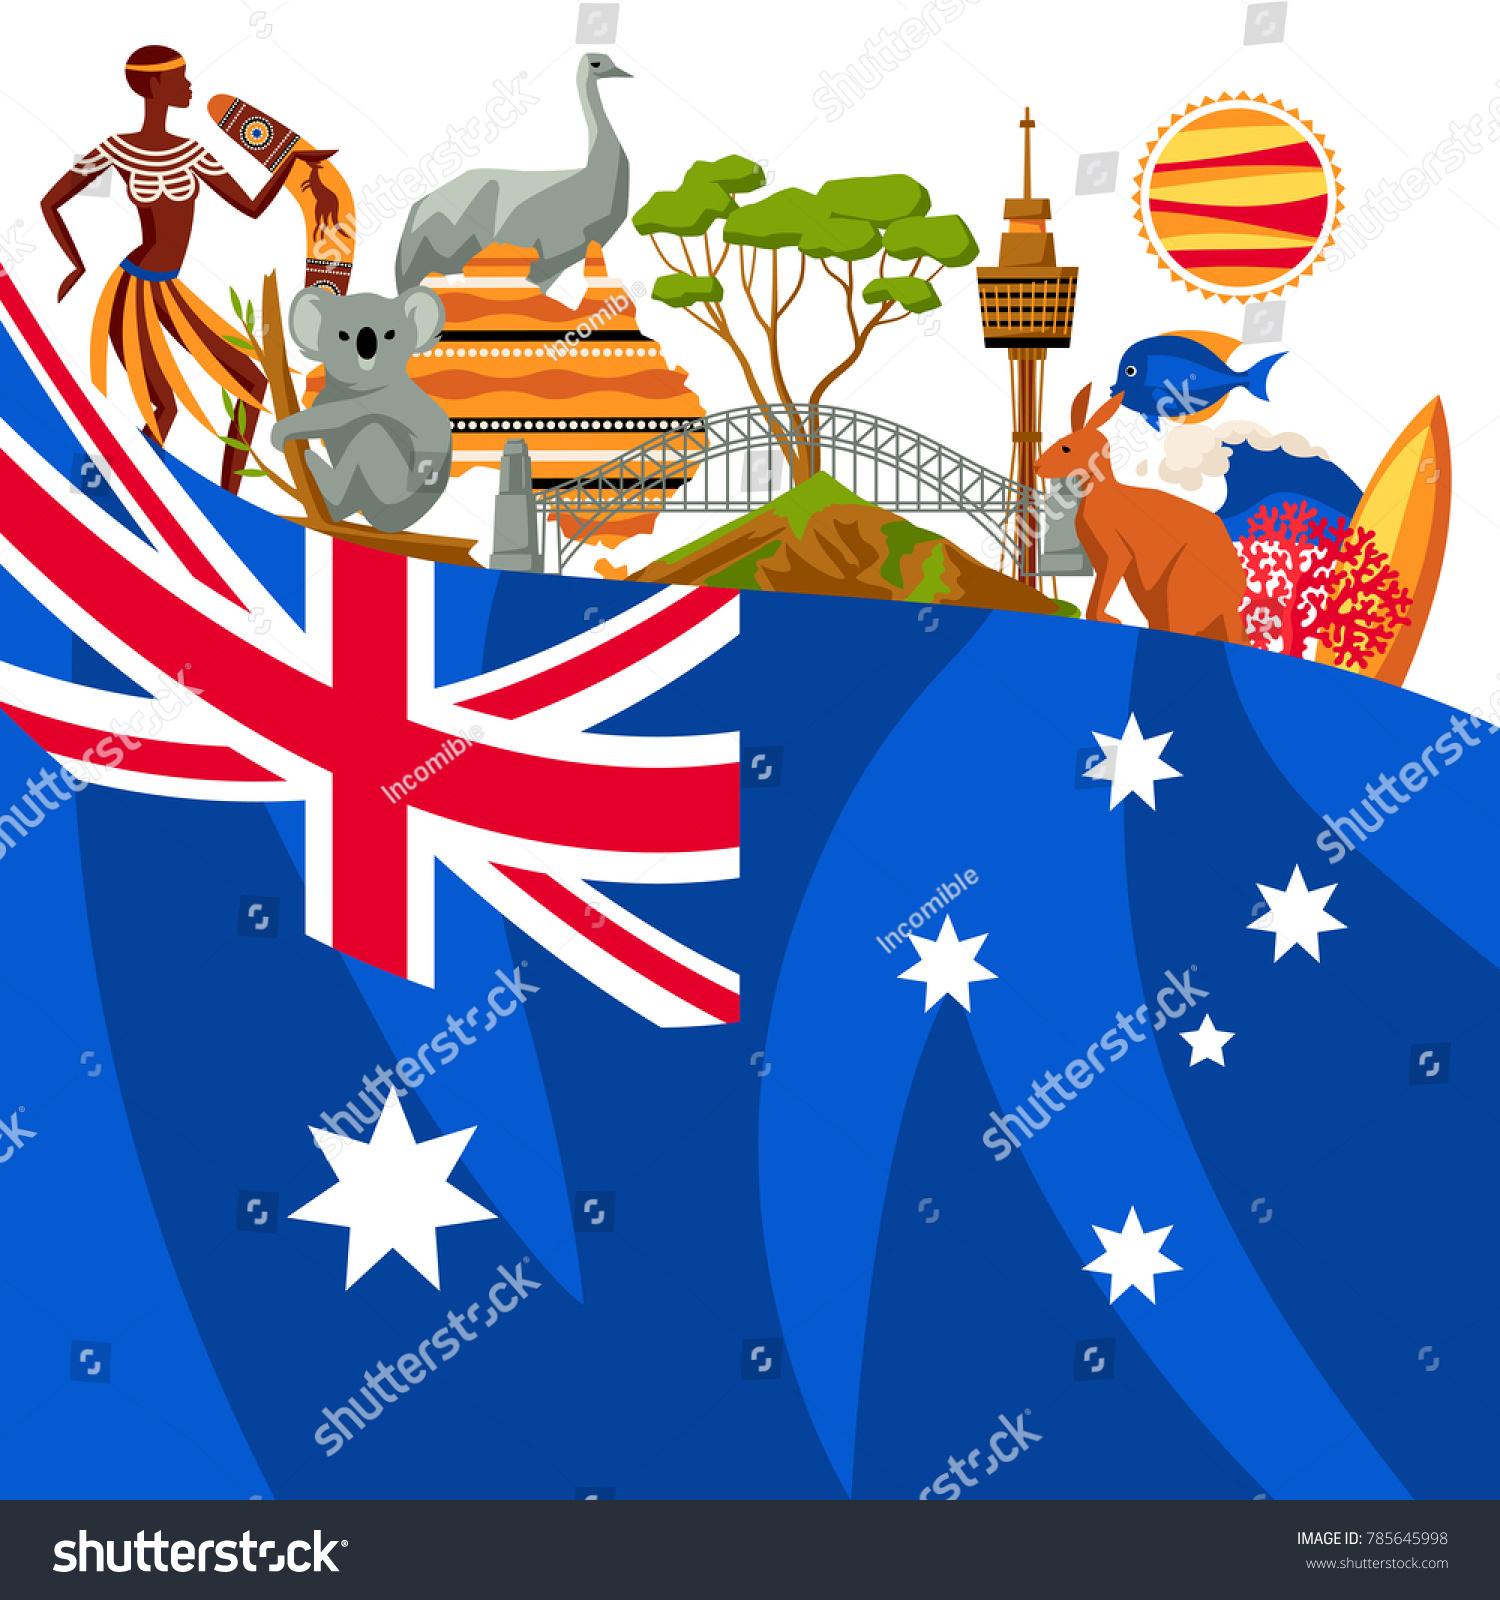 Australia background design australian traditional symbols stock australia background design australian traditional symbols and objects biocorpaavc Choice Image